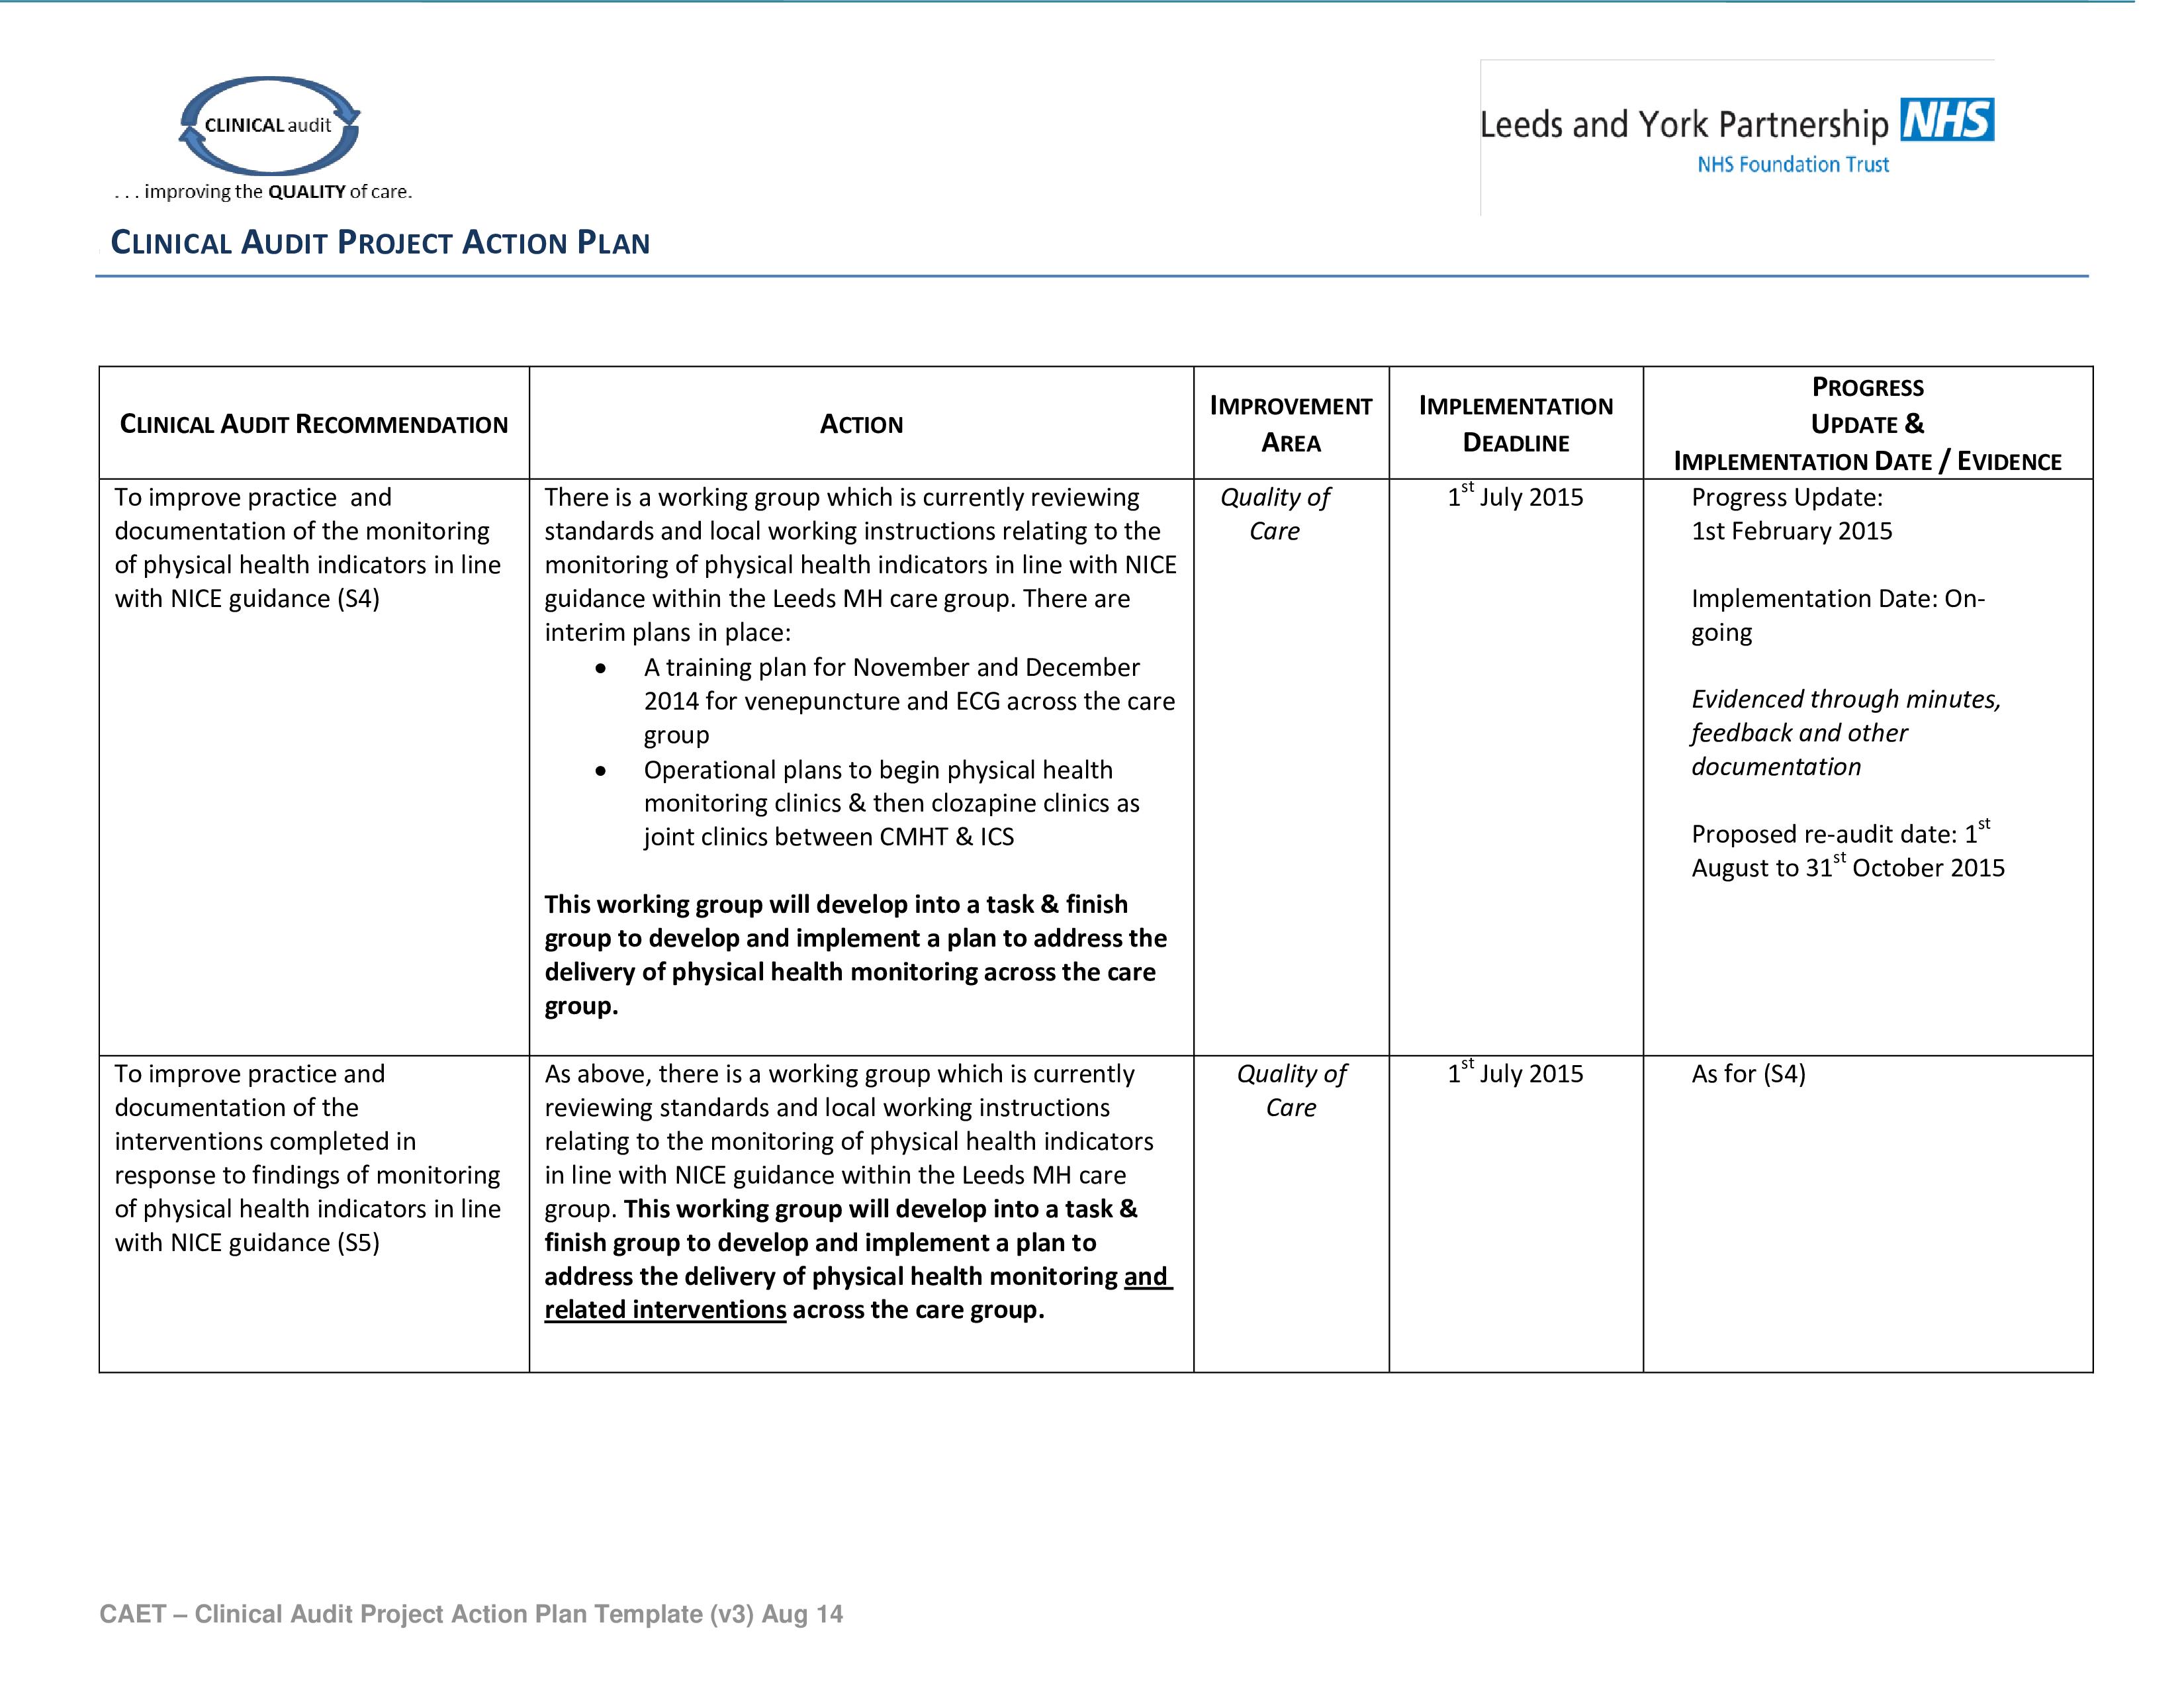 clinical audit action plan templates at. Black Bedroom Furniture Sets. Home Design Ideas